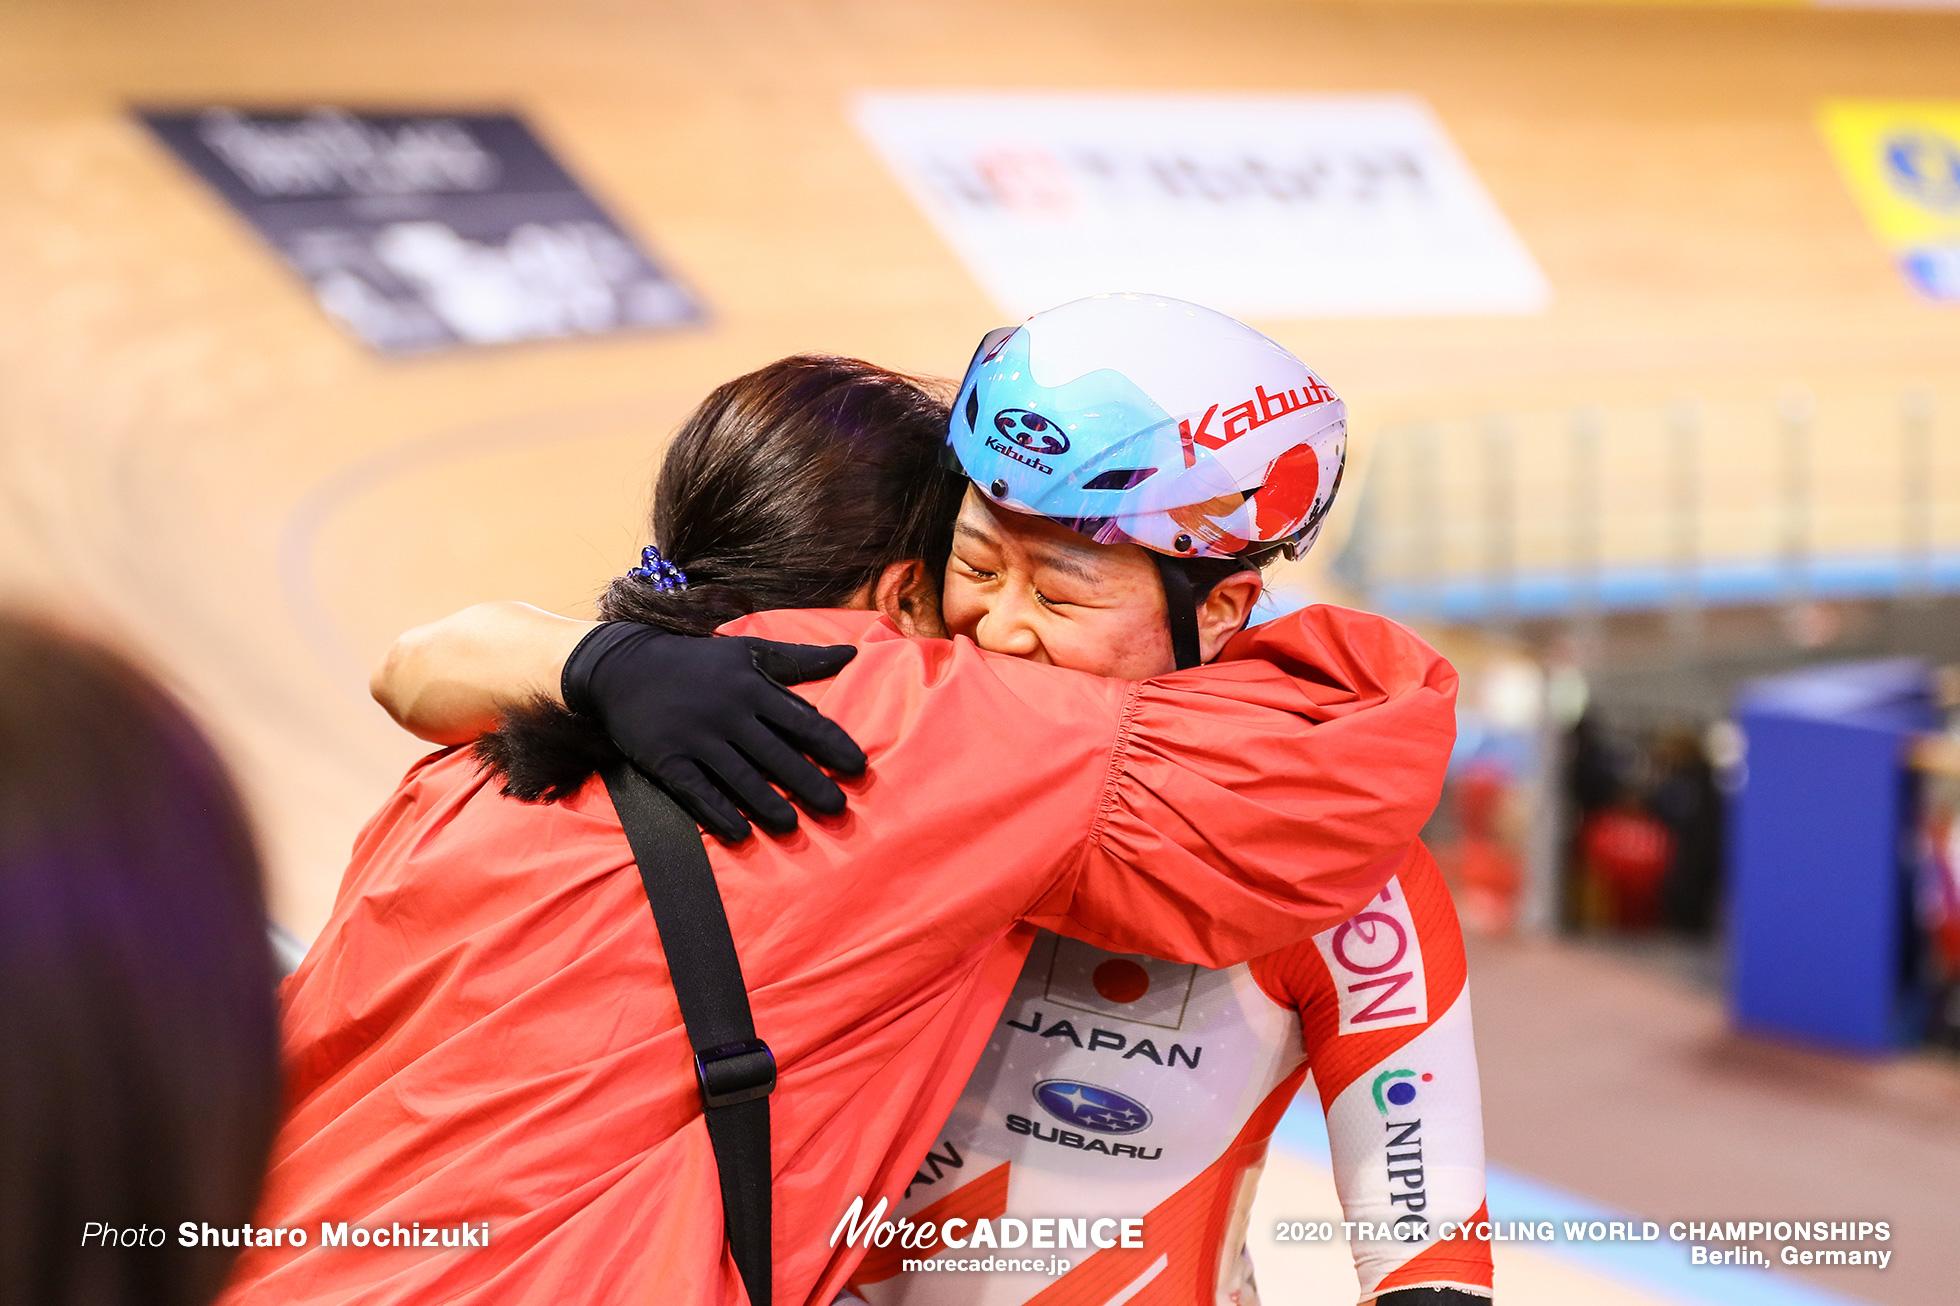 Point Race / Women's Omnium / 2020 Track Cycling World Championships, Kajihara Yumi 梶原悠未